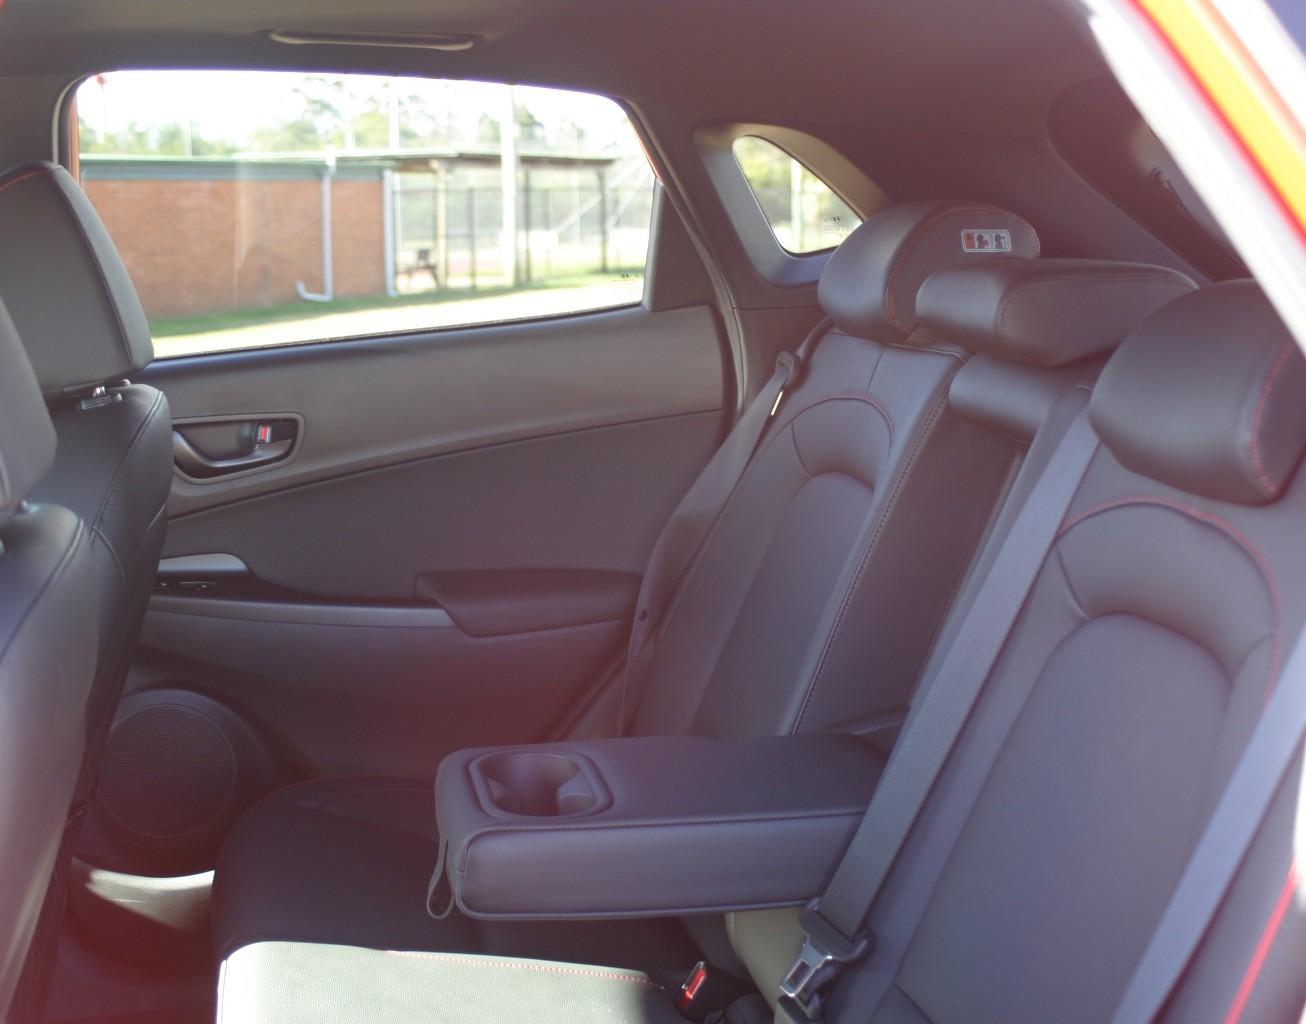 Hyundai Kona N Line Premium rear seats